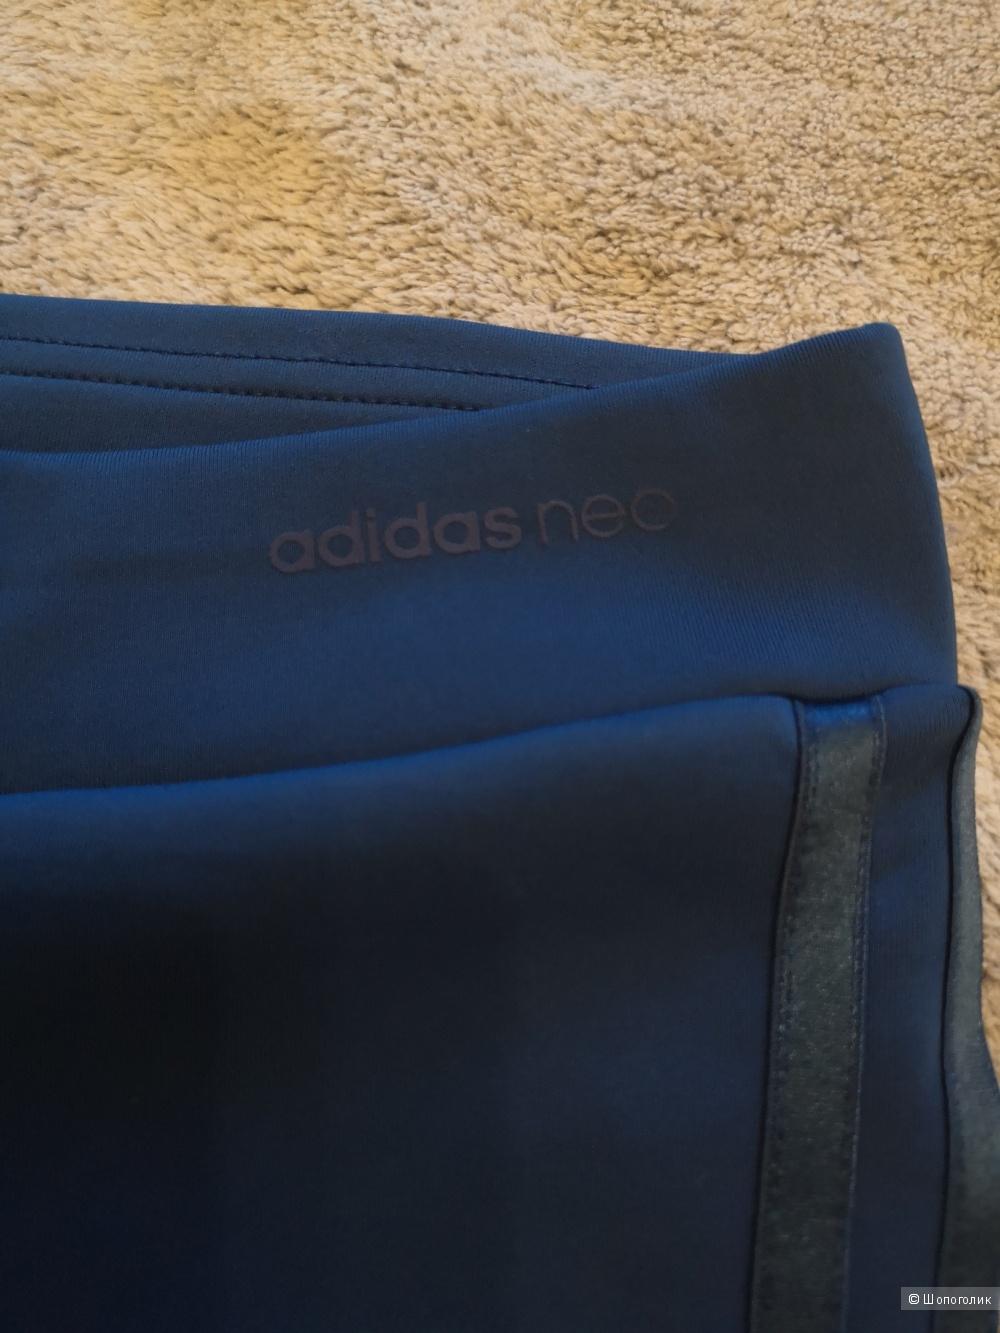 Леггинсы Adidas, размер М (на L)